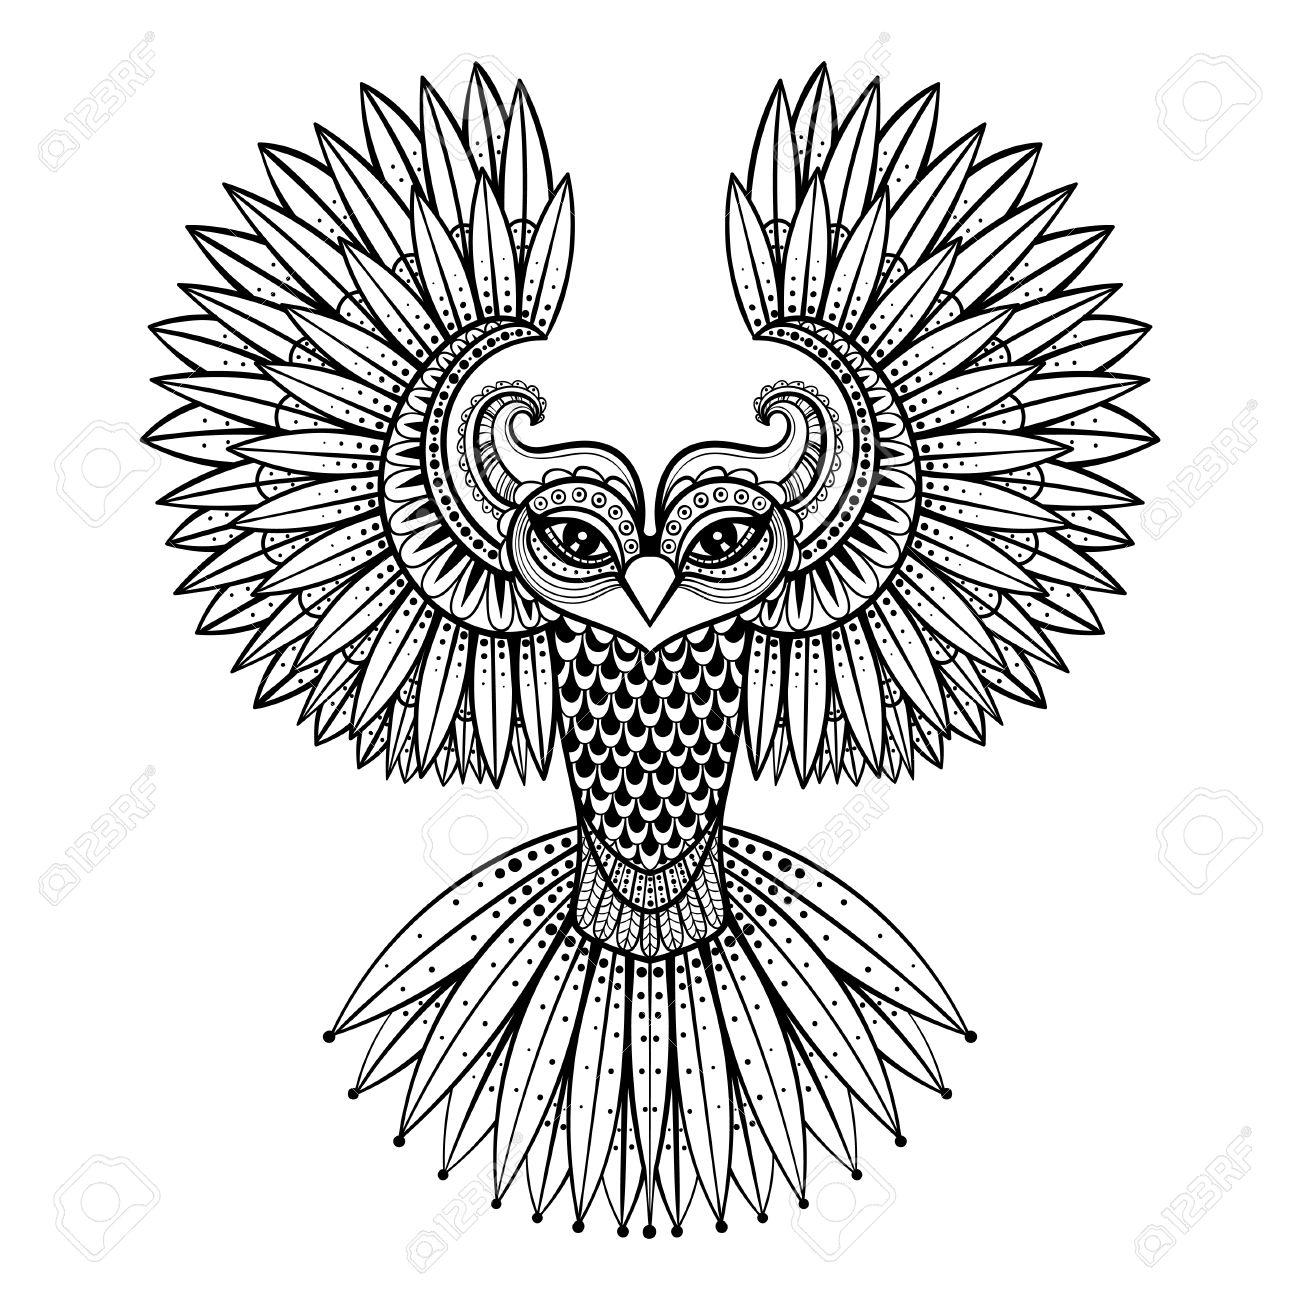 1300x1300 Vector Ornamental Owl, Ethnic Zentangled Mascot, Amulet, Mask